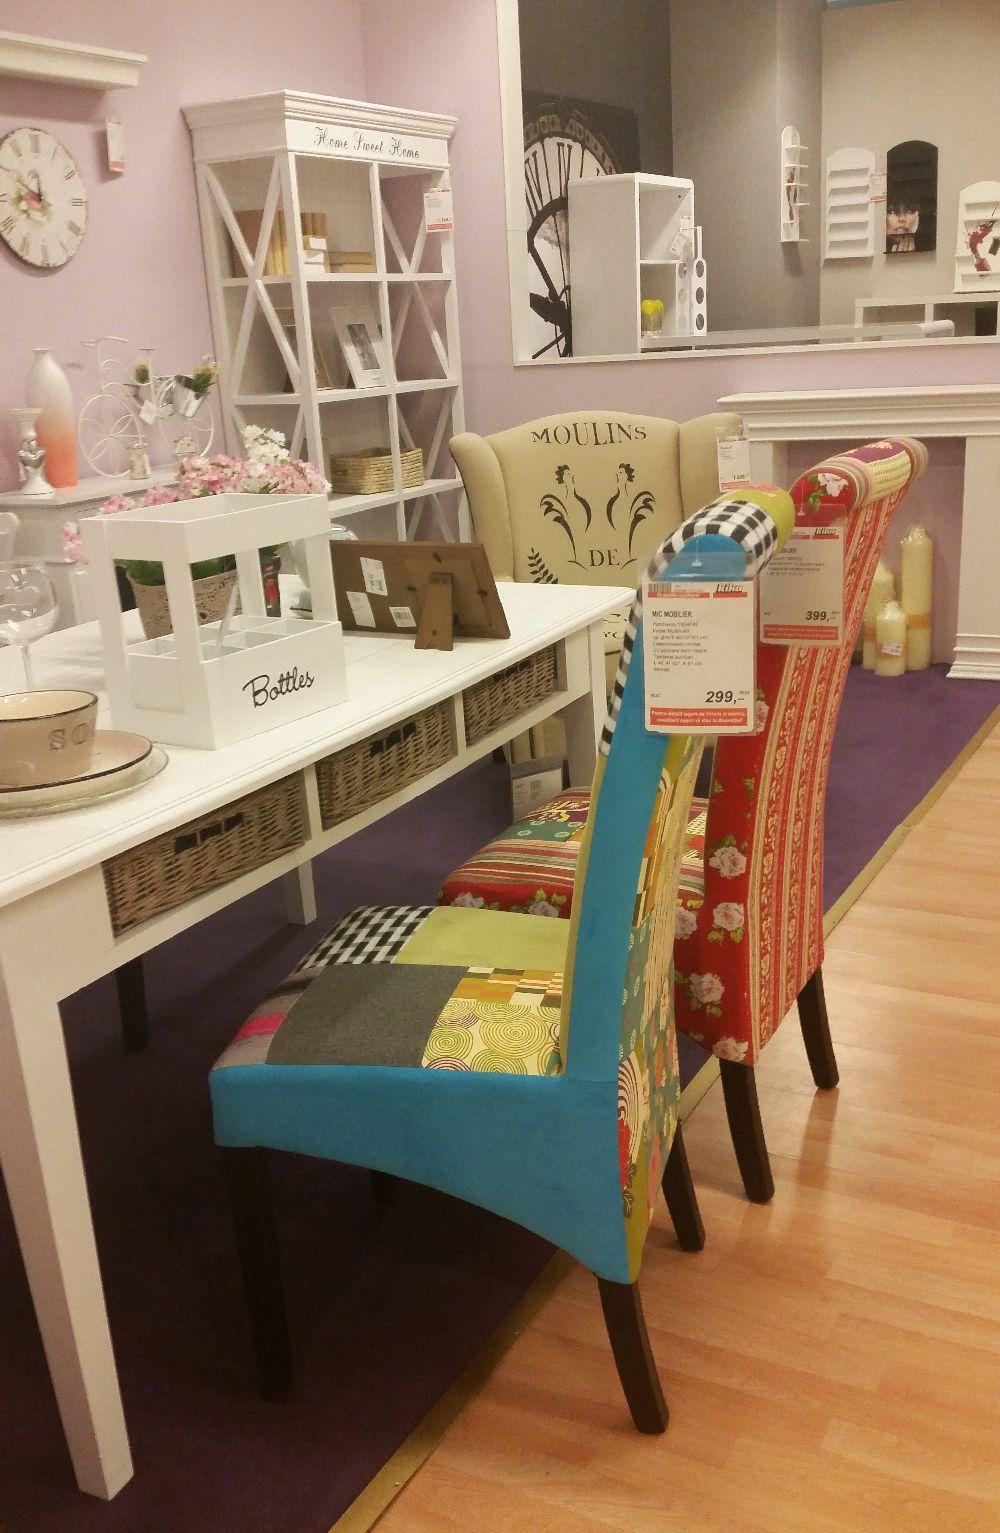 adelaparvu.com despre mic mobilier colectia vara 2015 Kika (7)